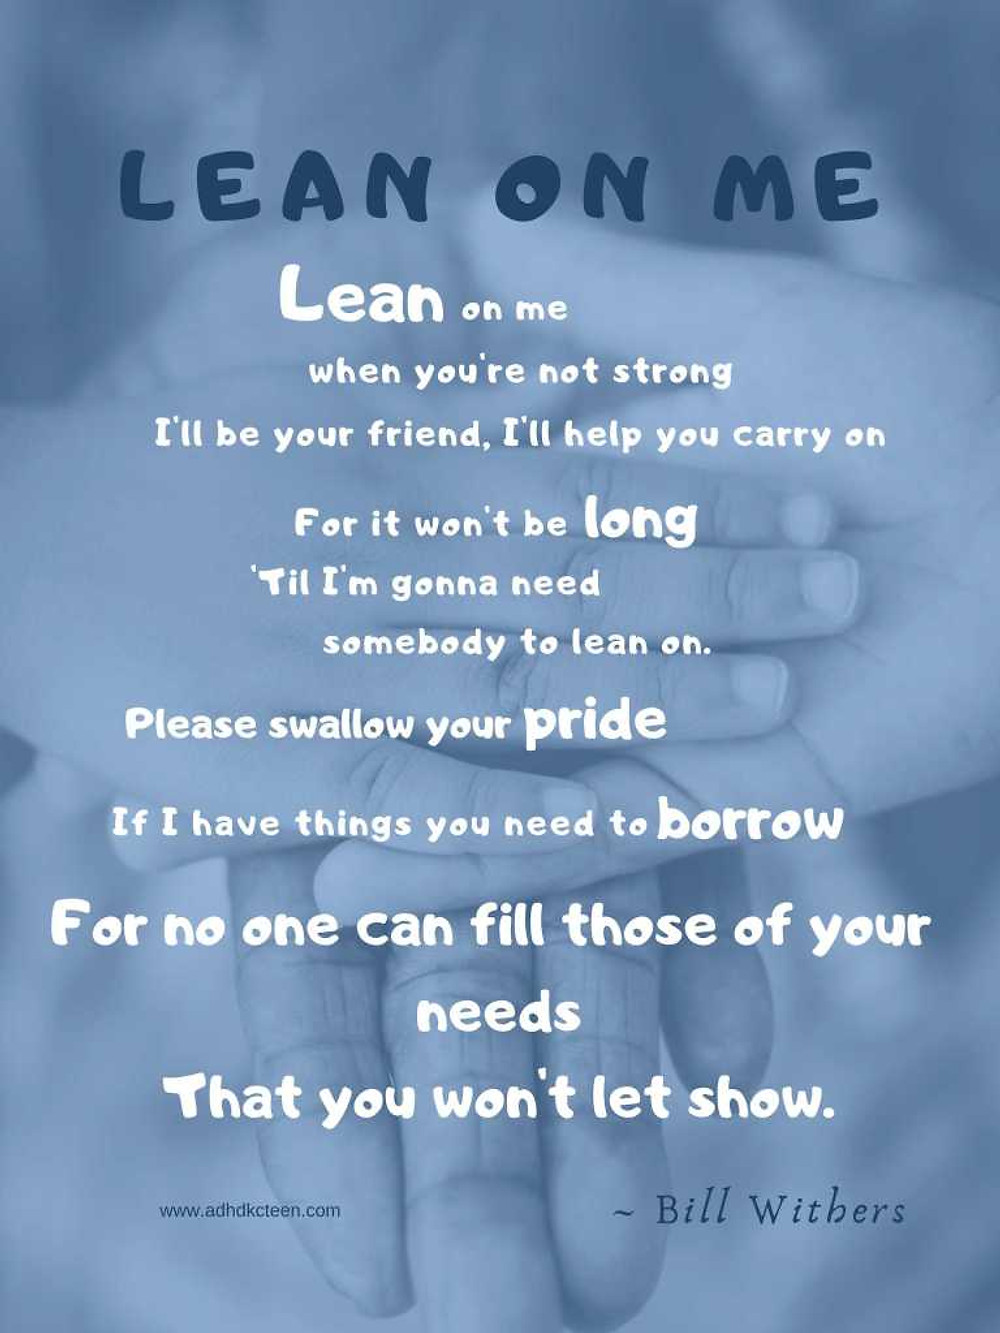 Lean On Me lyrics share a fantastic message. #friends @adhdkcteen